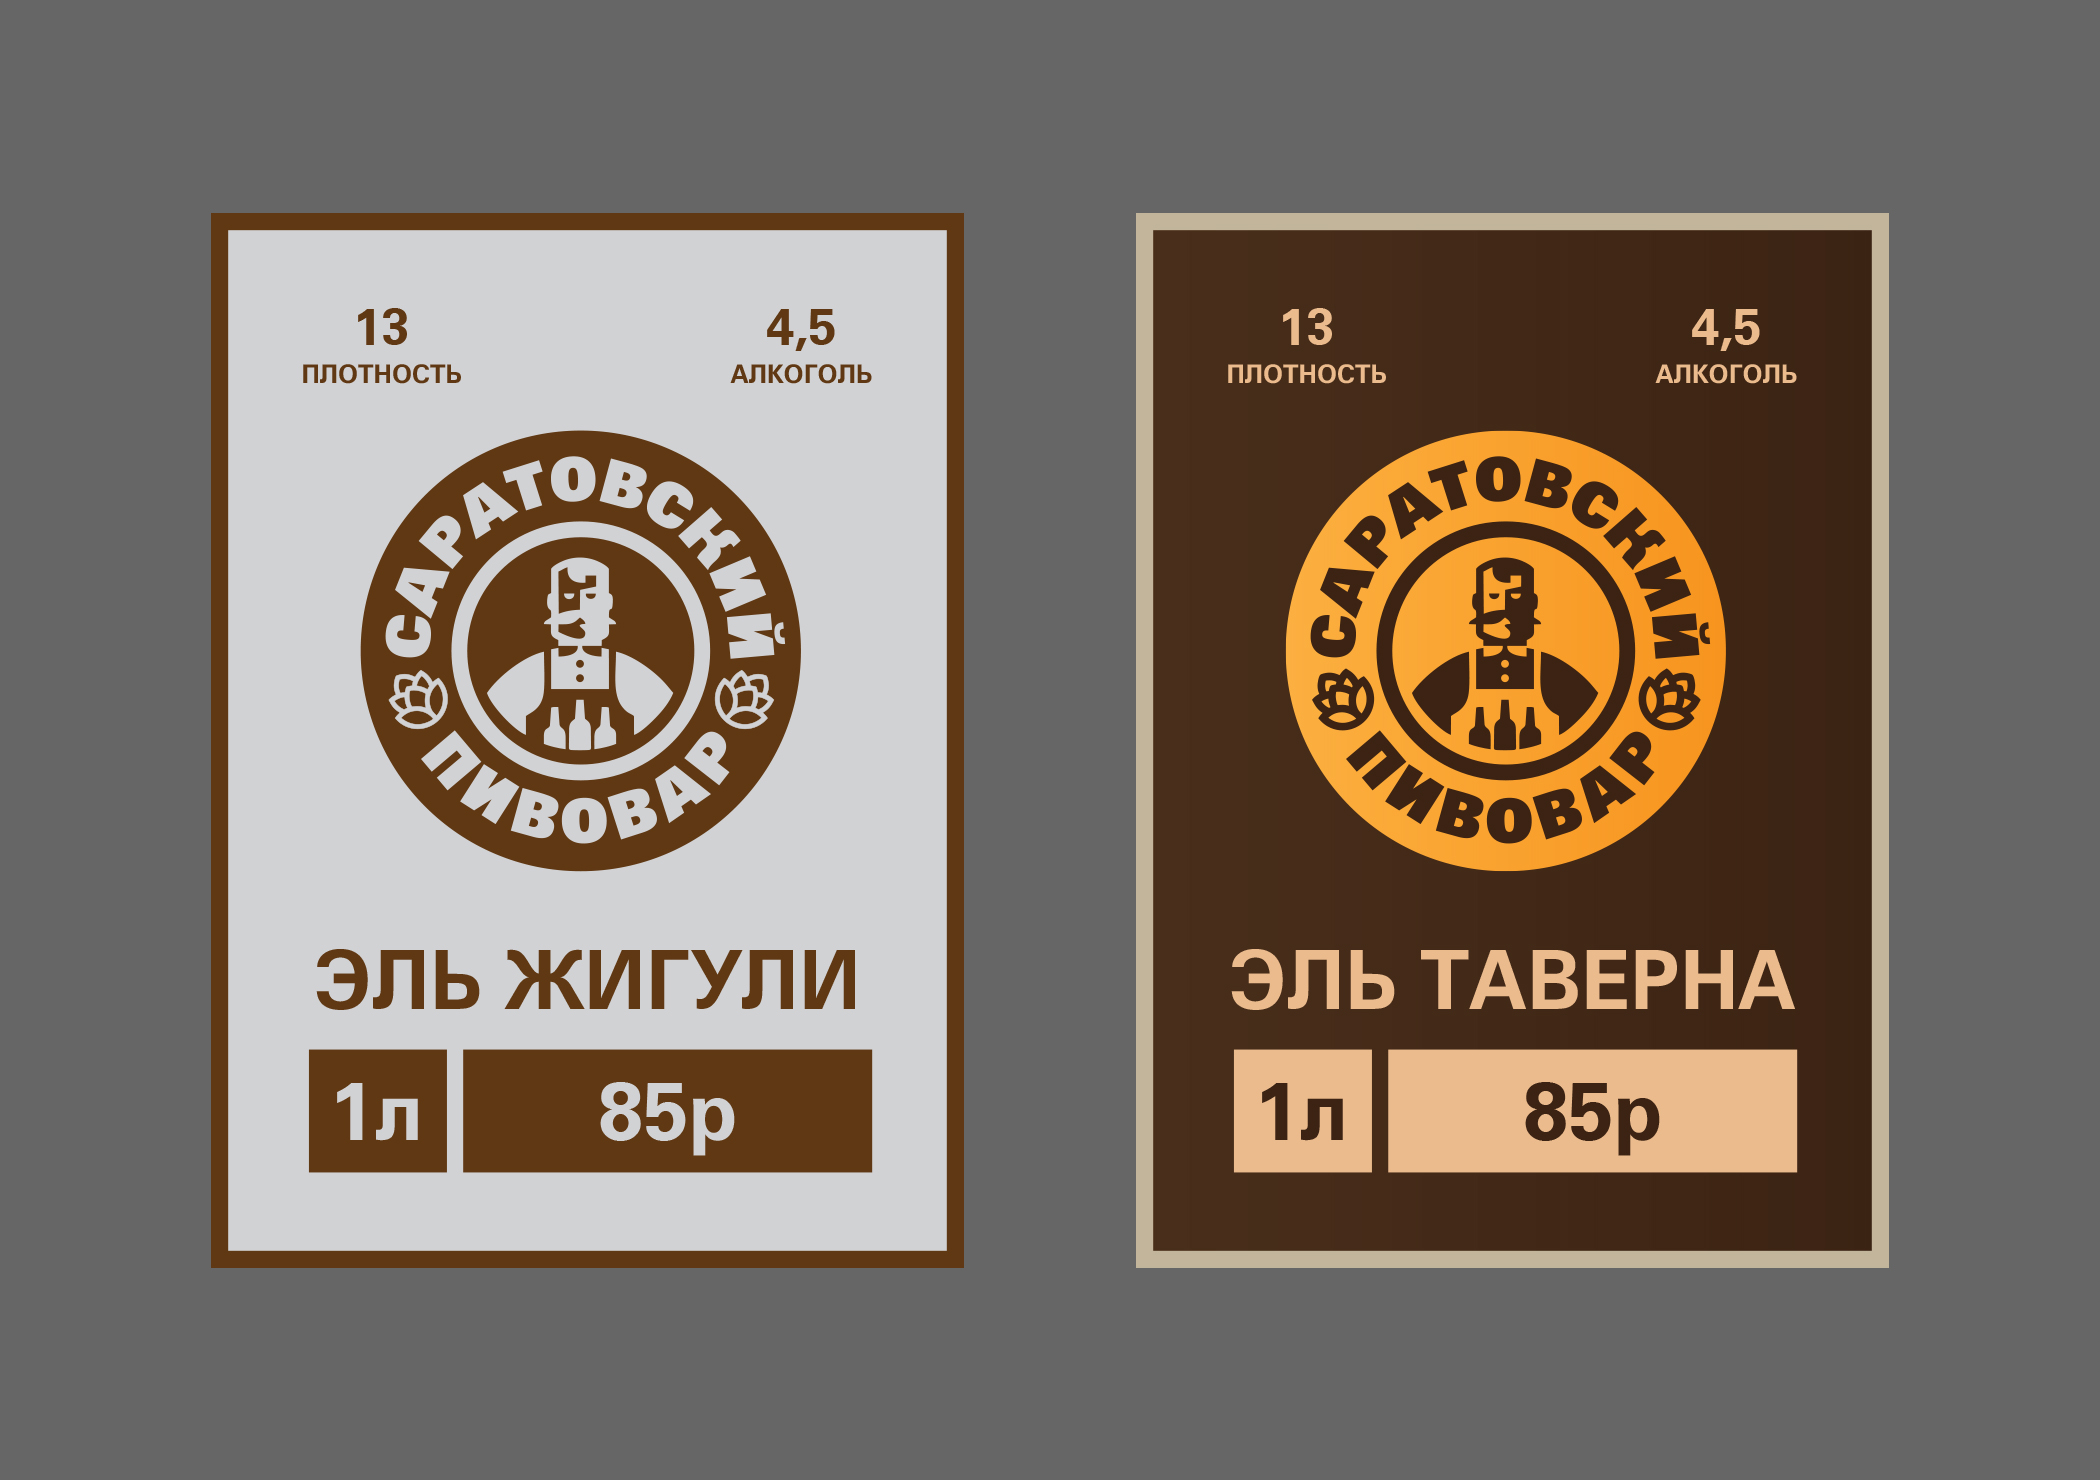 Разработка логотипа для частной пивоварни фото f_6695d7a991cbd2a0.jpg